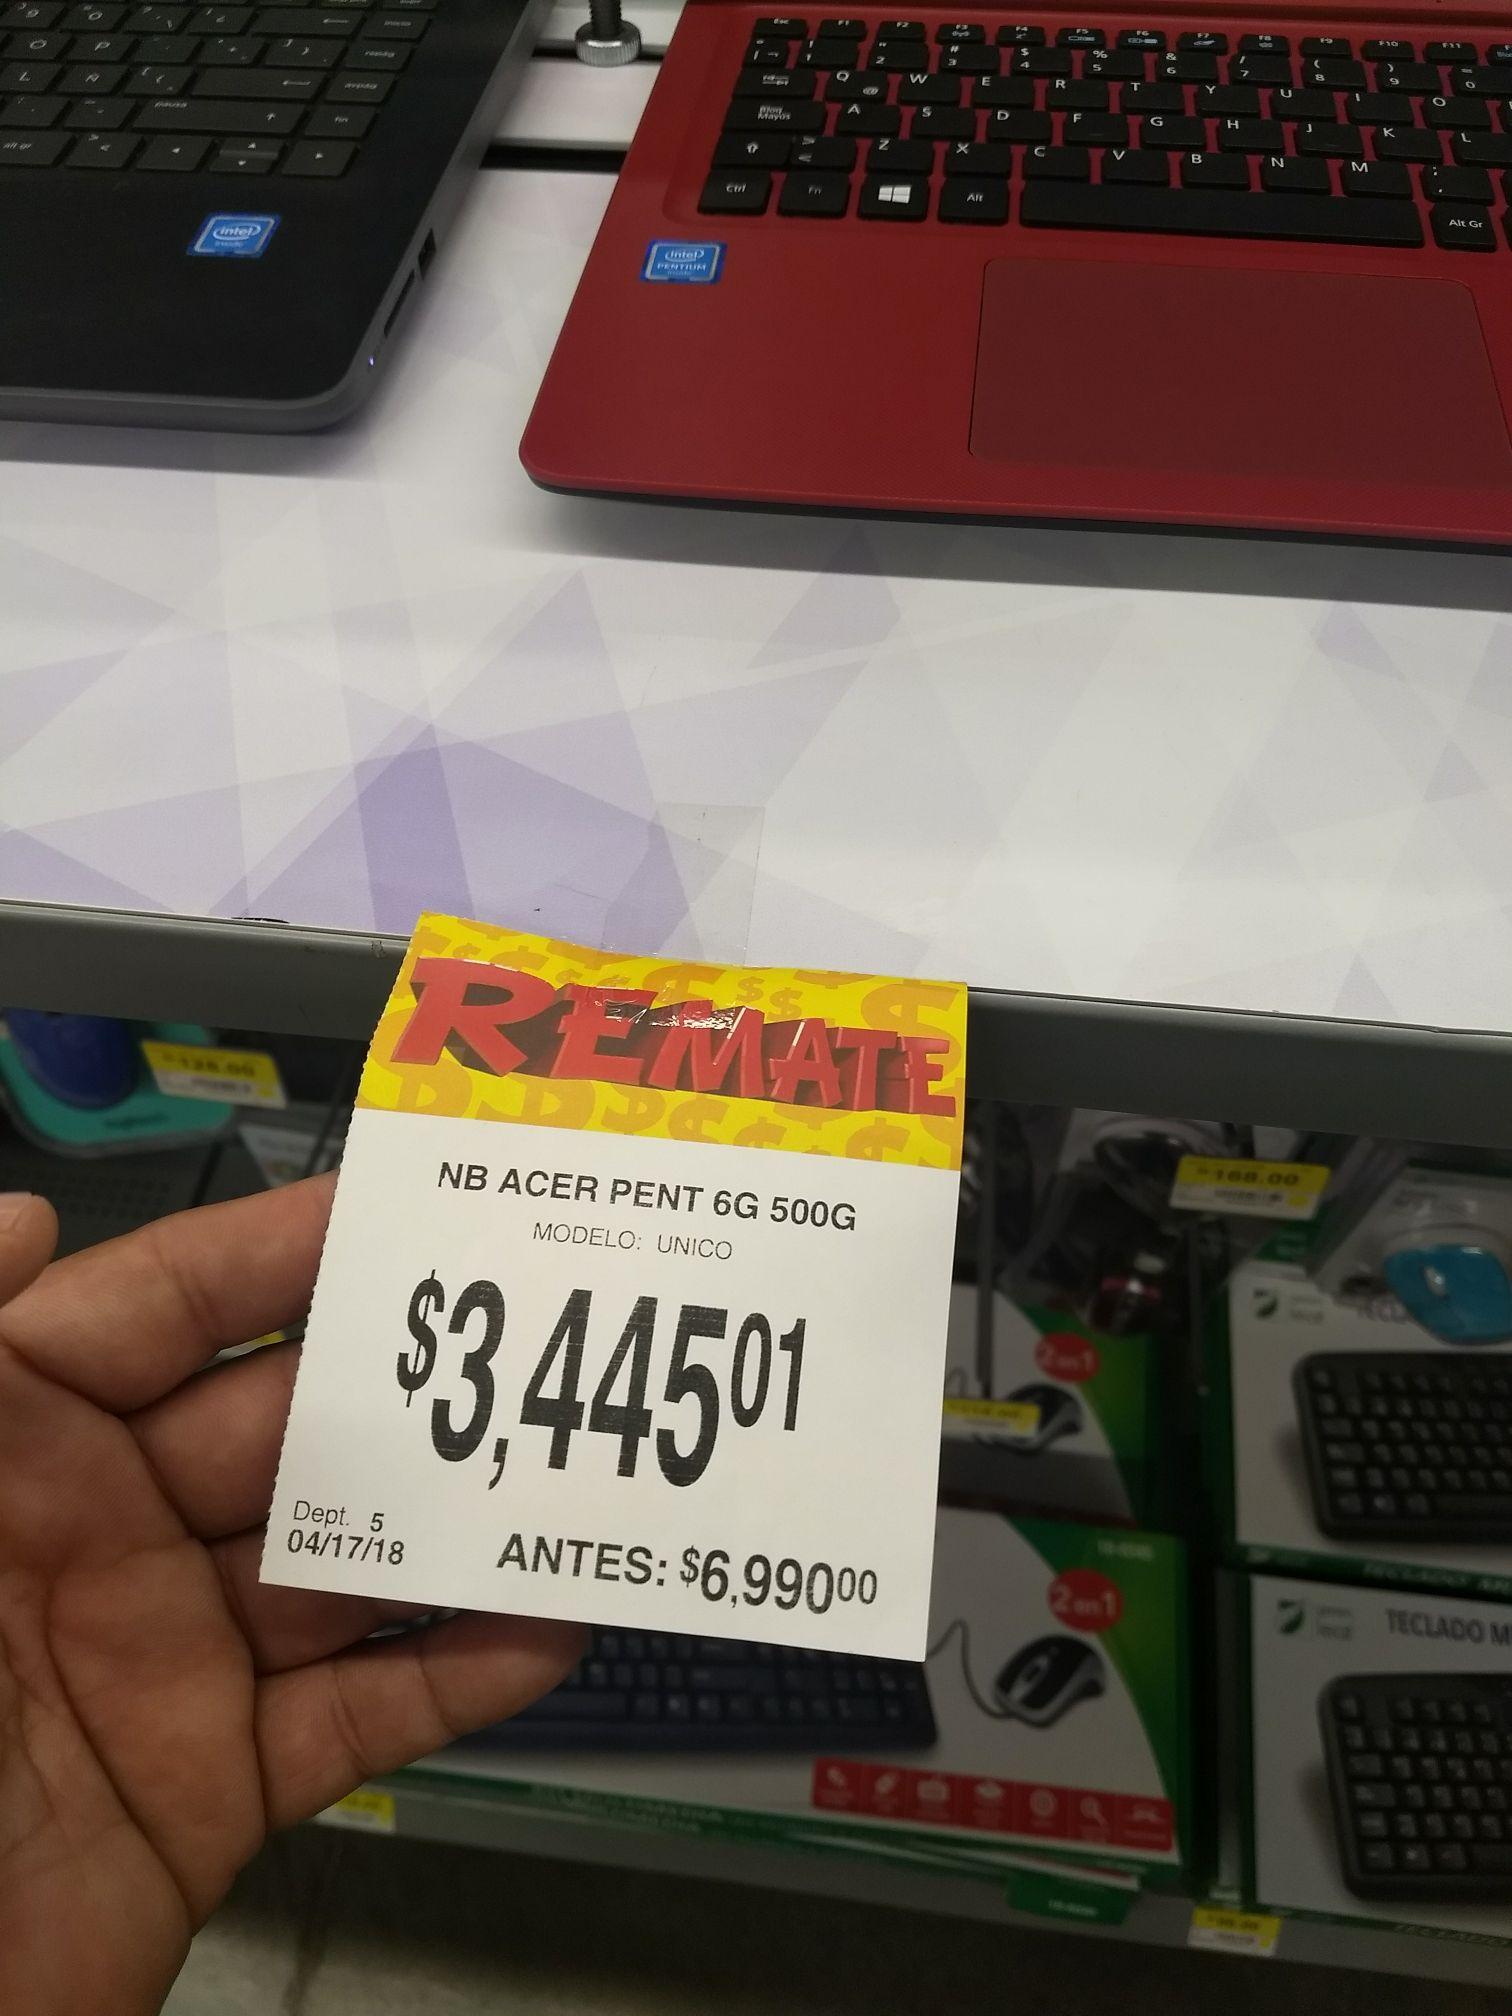 Bodega Aurrerá: Laptop Acer pent 6g 500